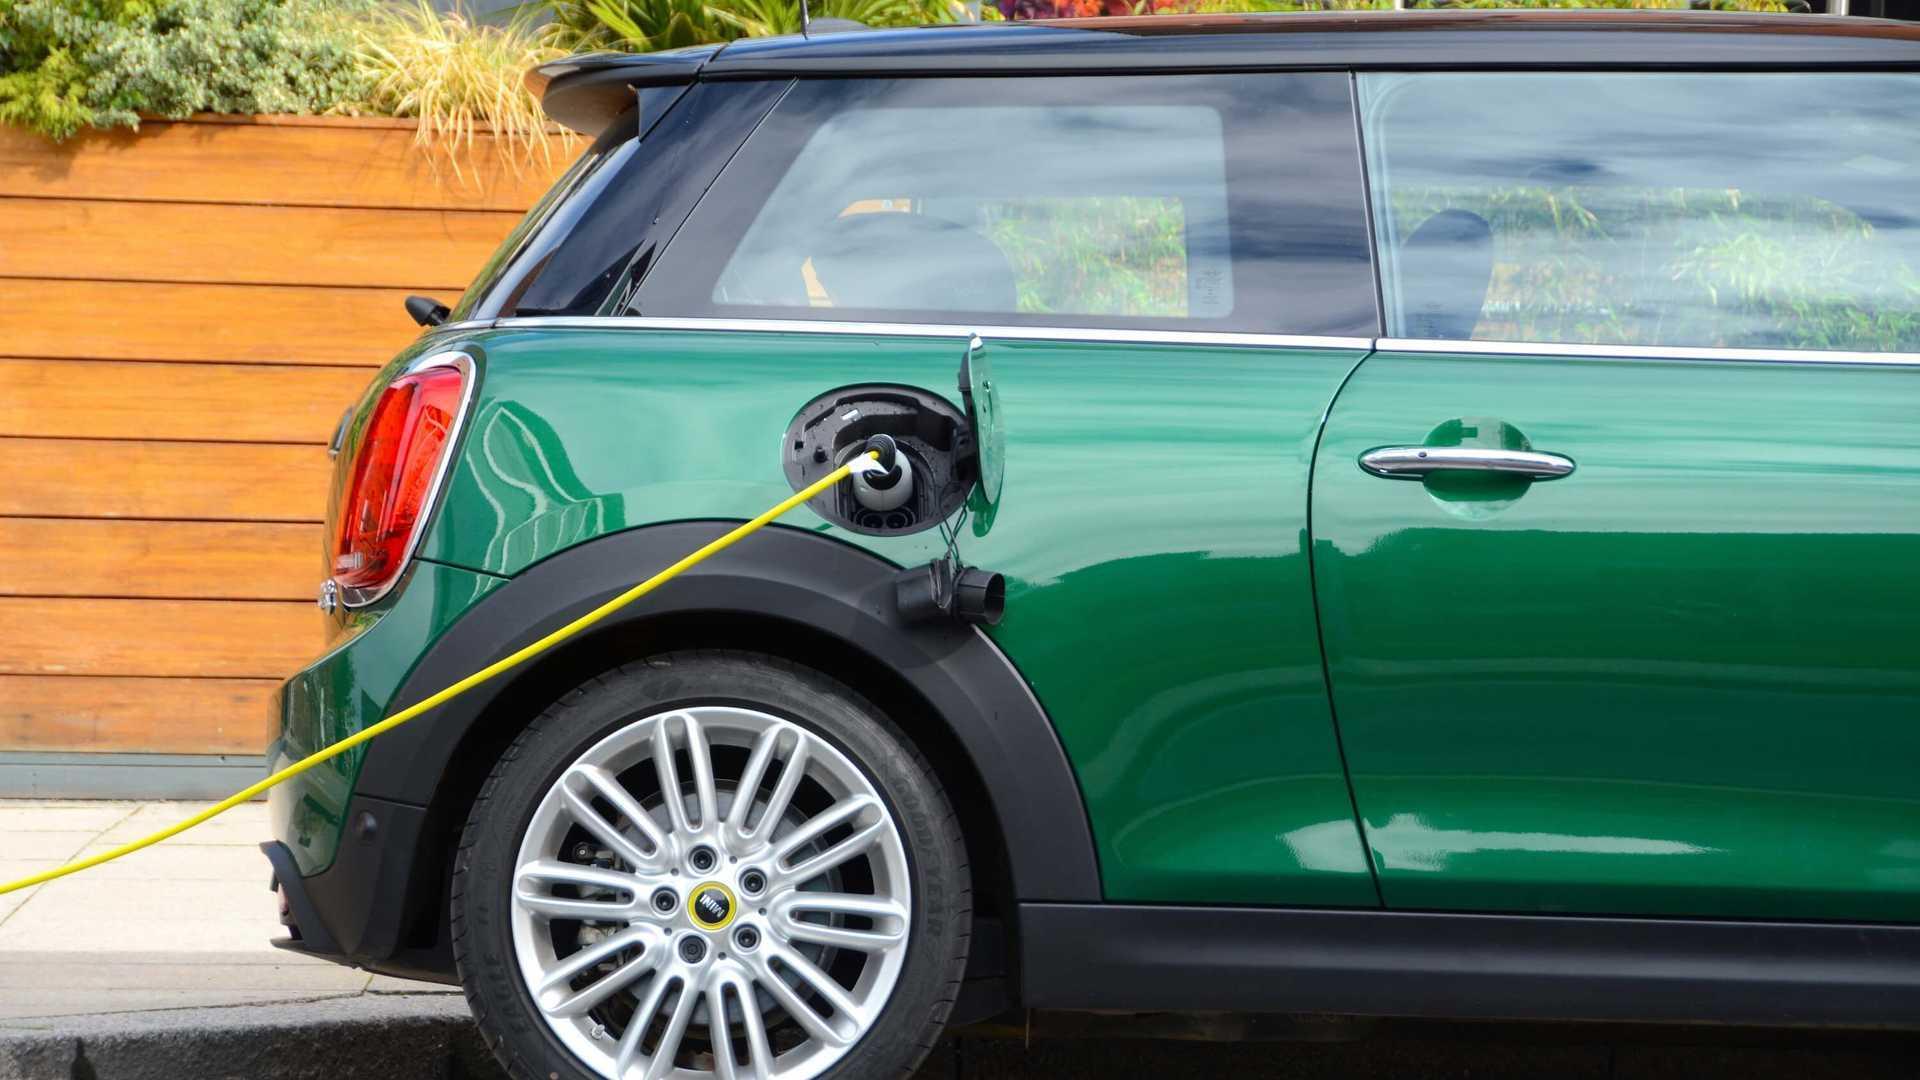 John Cooper Works to become Mini's EV-focused performance sub-brand